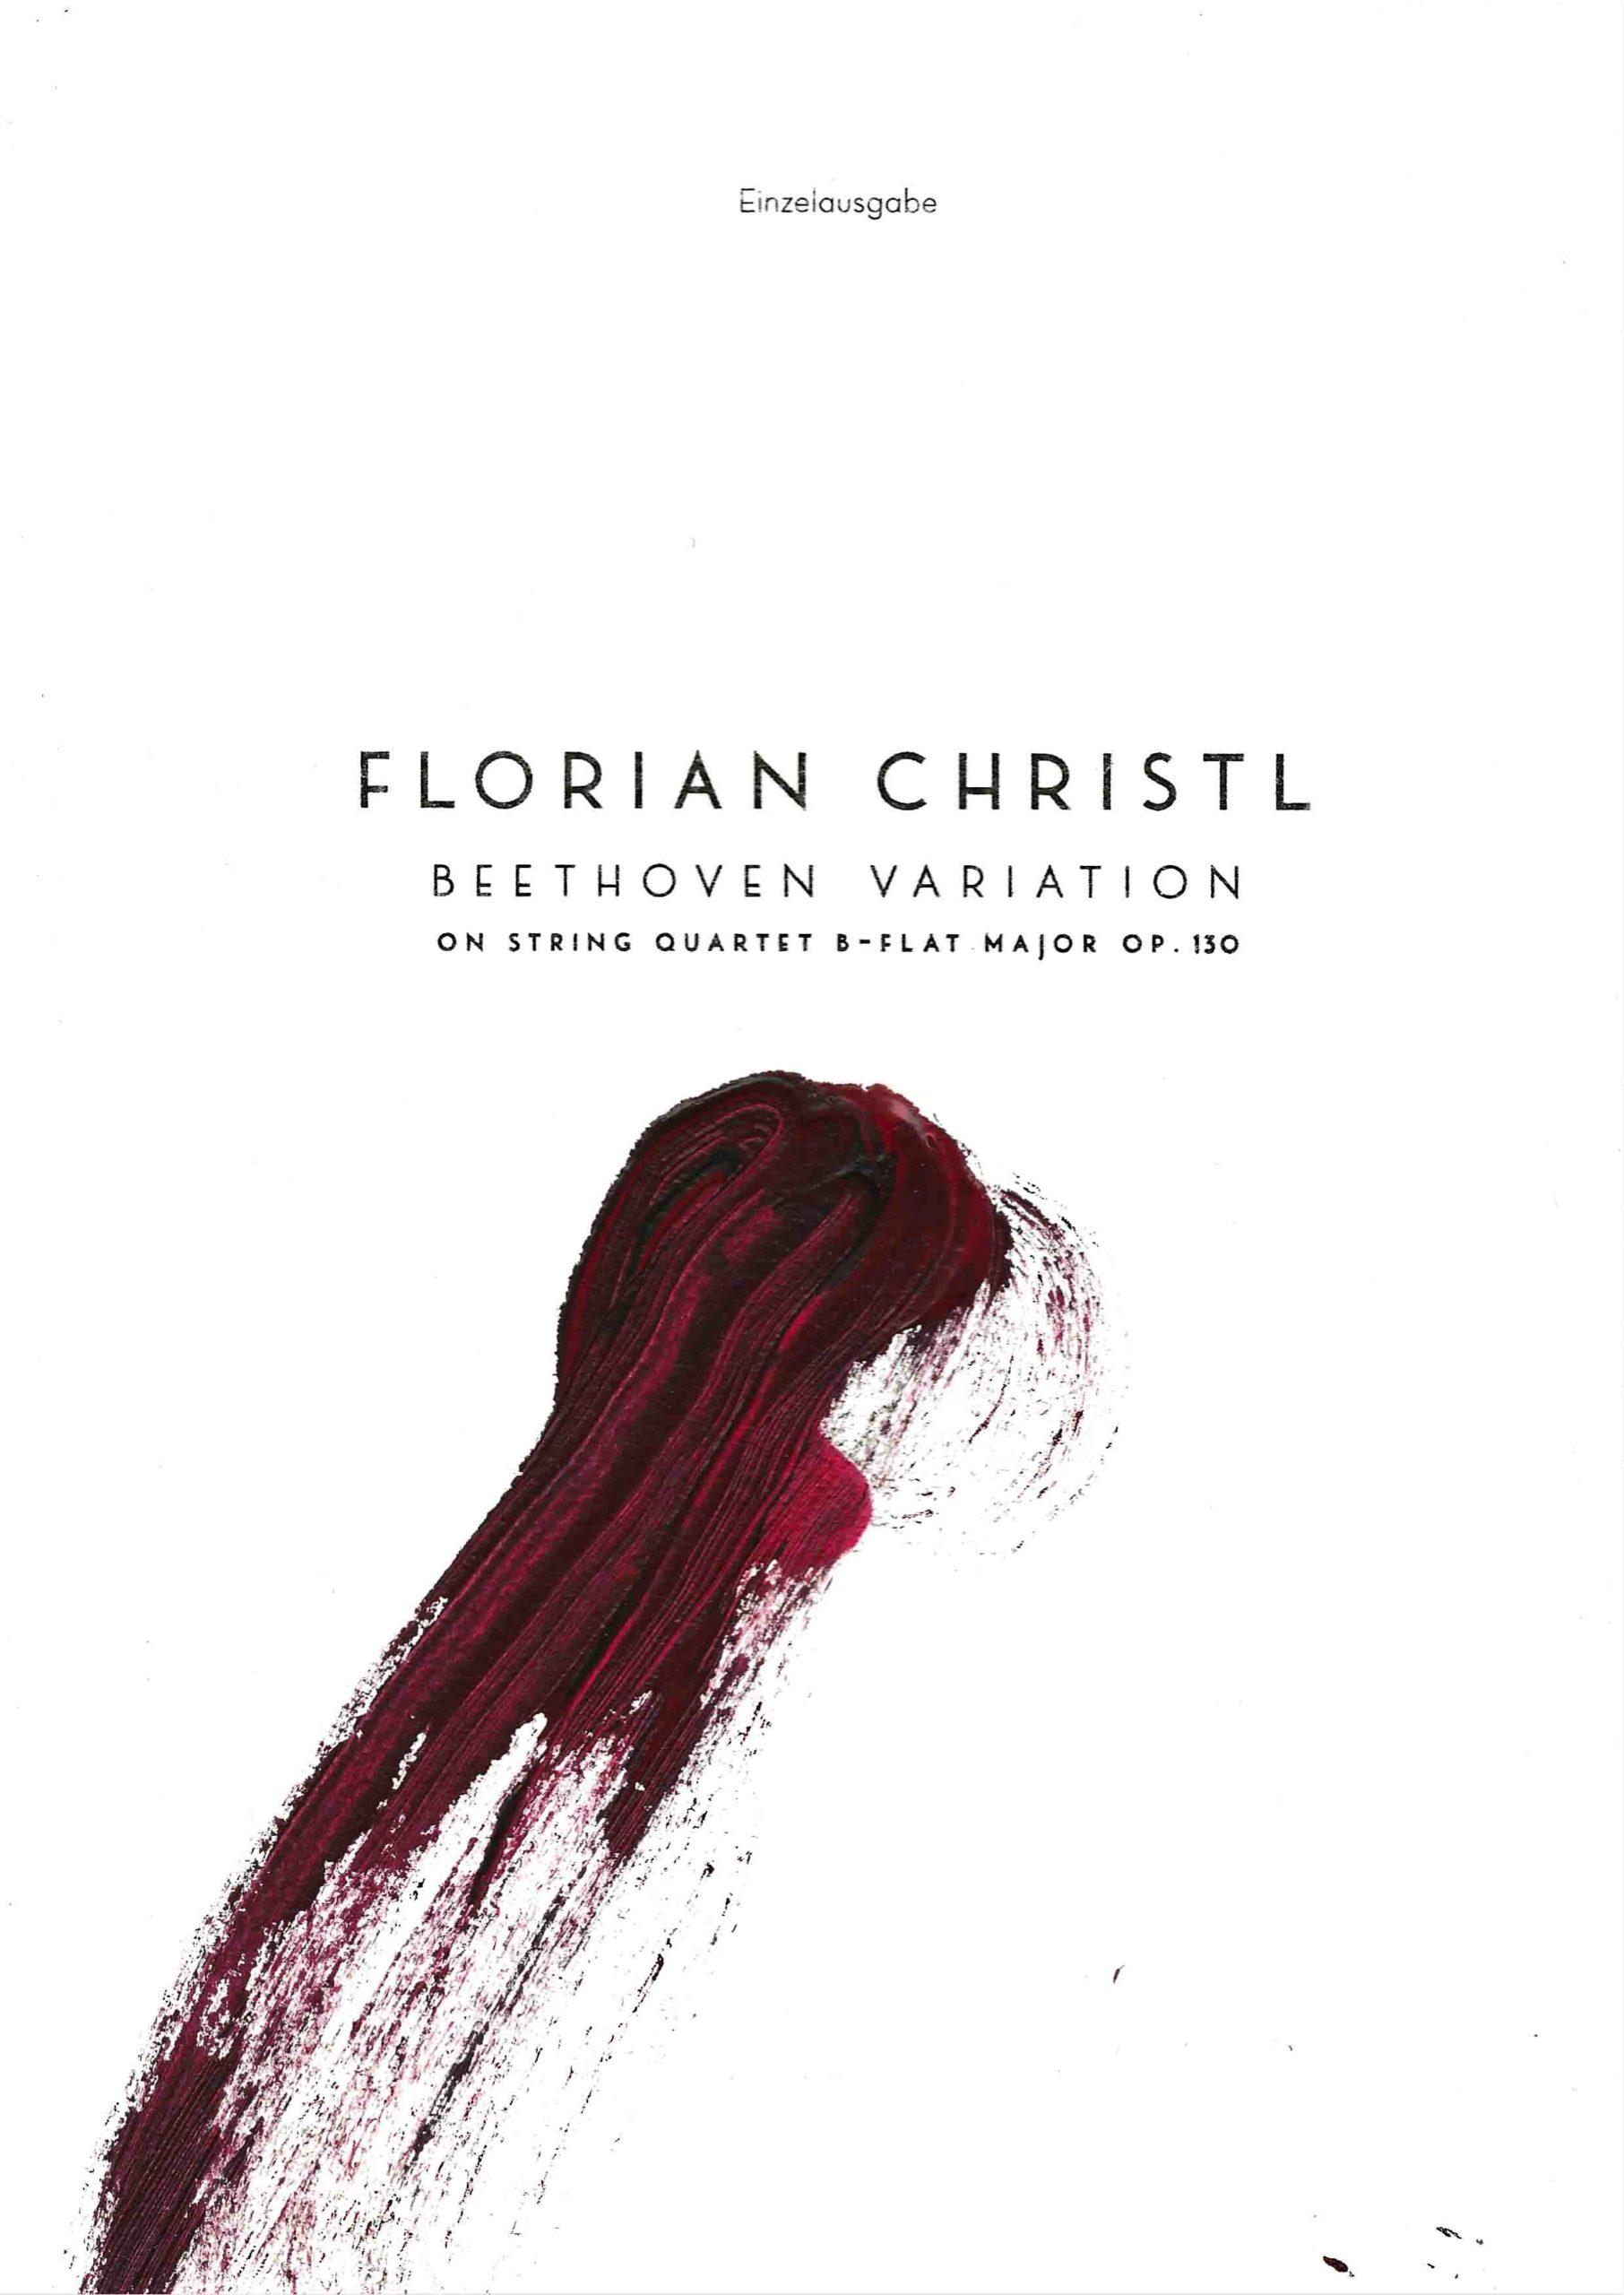 Florian Christl | Music Sheet | Beethoven Variation | 1st edition | 011